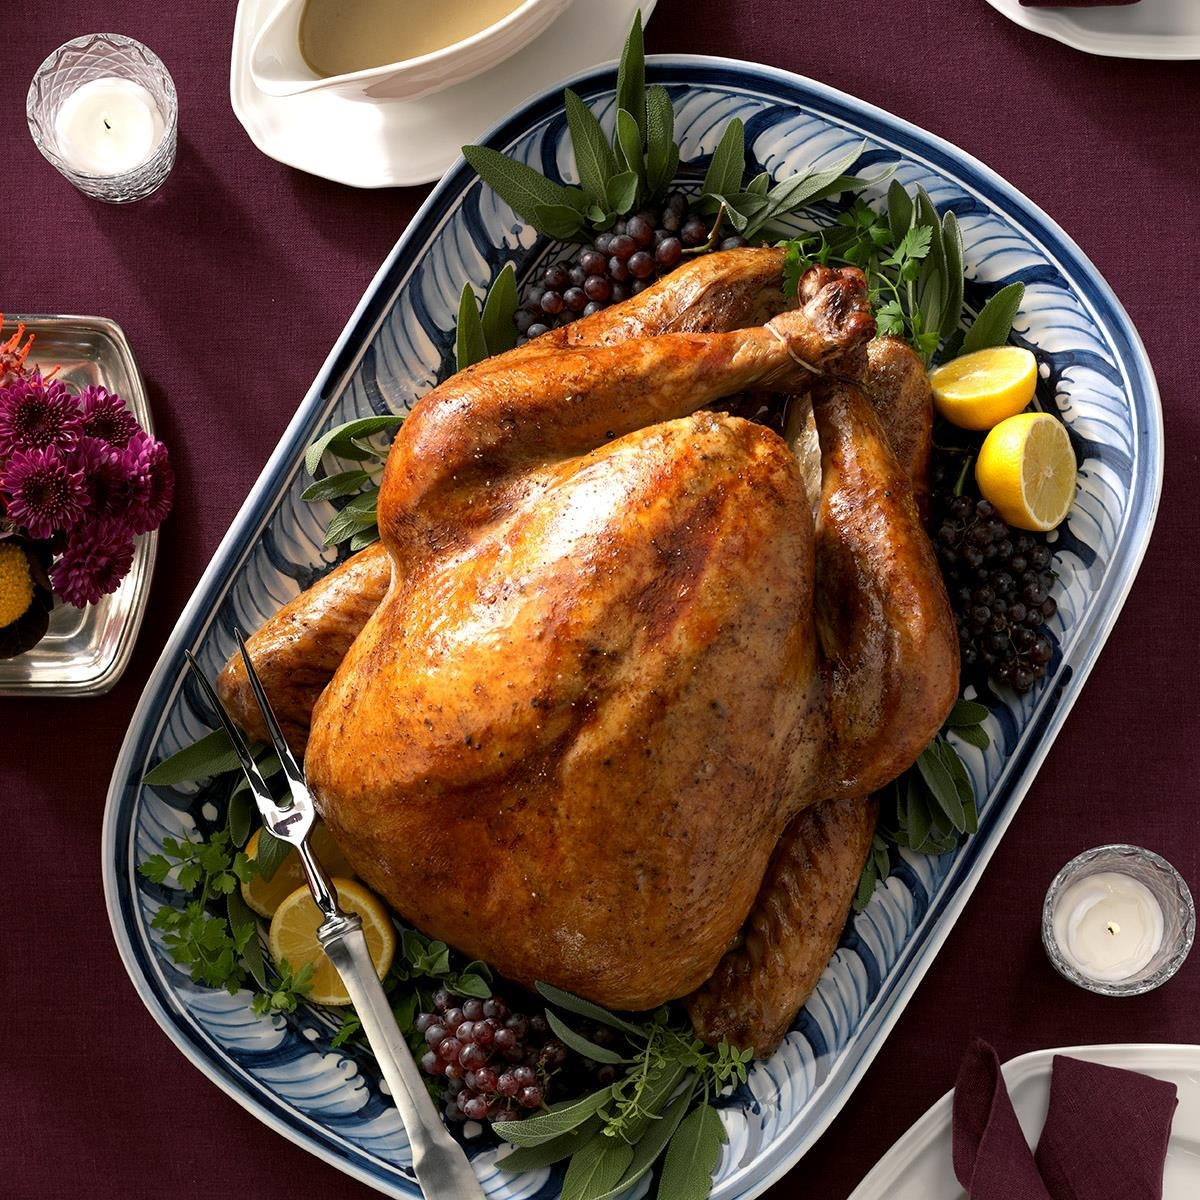 New Hampshire: Maple-Sage Brined Turkey